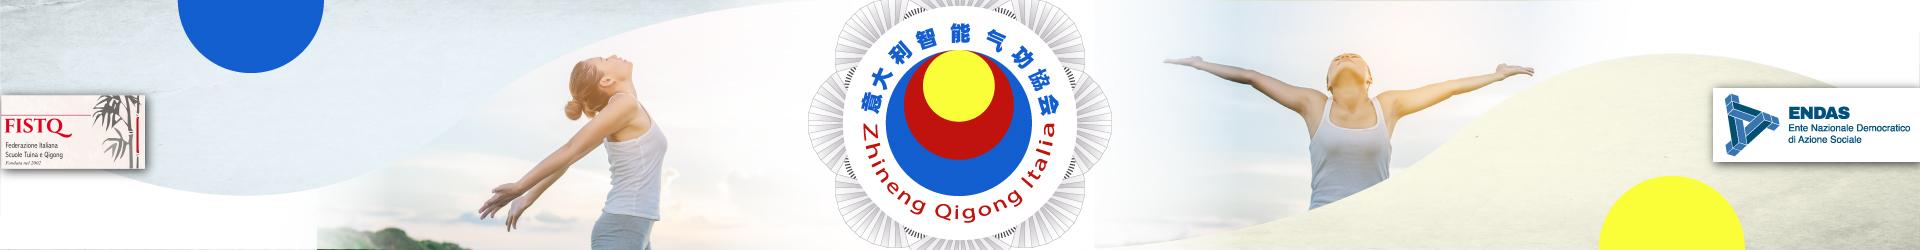 Associazione Sportiva Dilettantistica Zhineng QiGong Italia